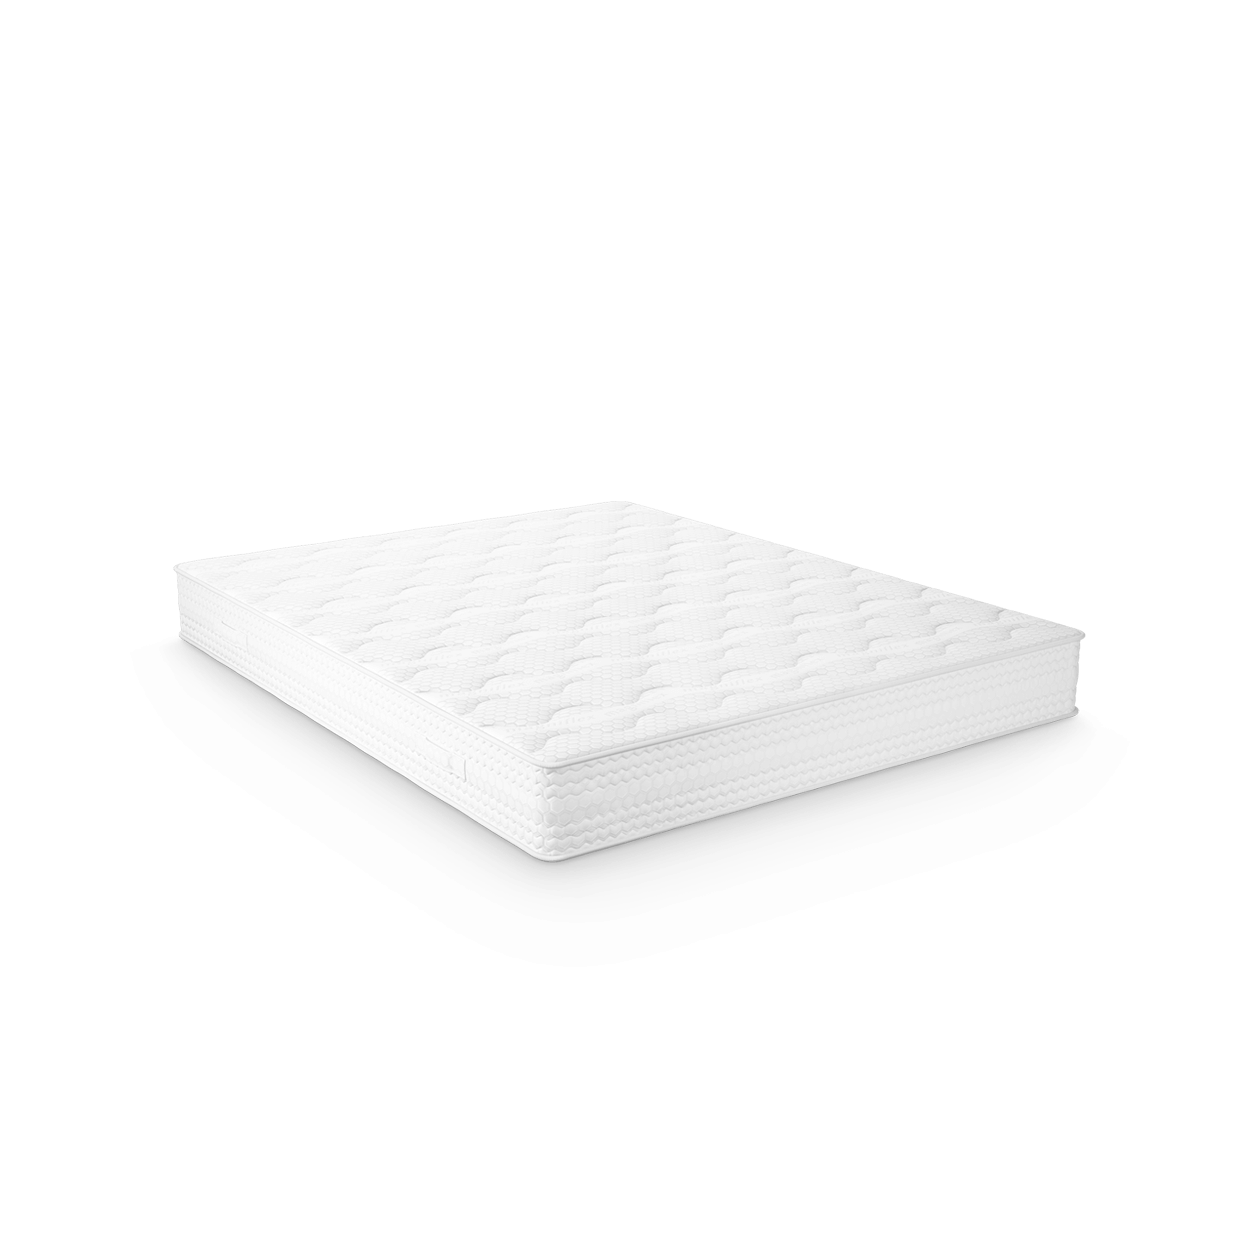 Relano neo матрак, от Magniflex